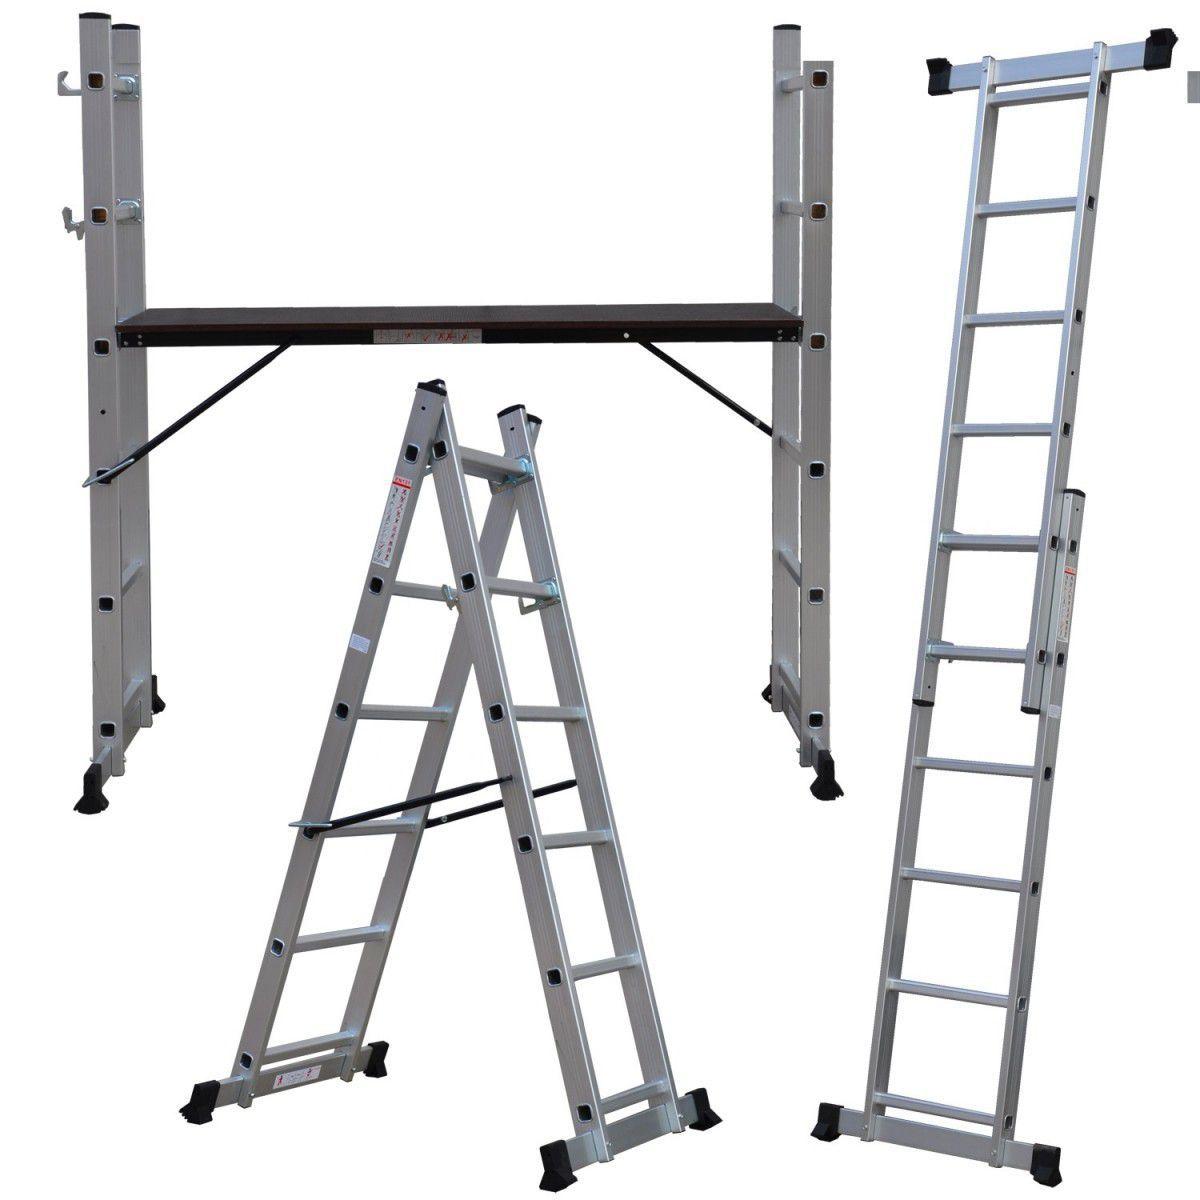 Escada Multifuncional Plataforma 5x2 Degraus Alumínio 150Kg  - Strong